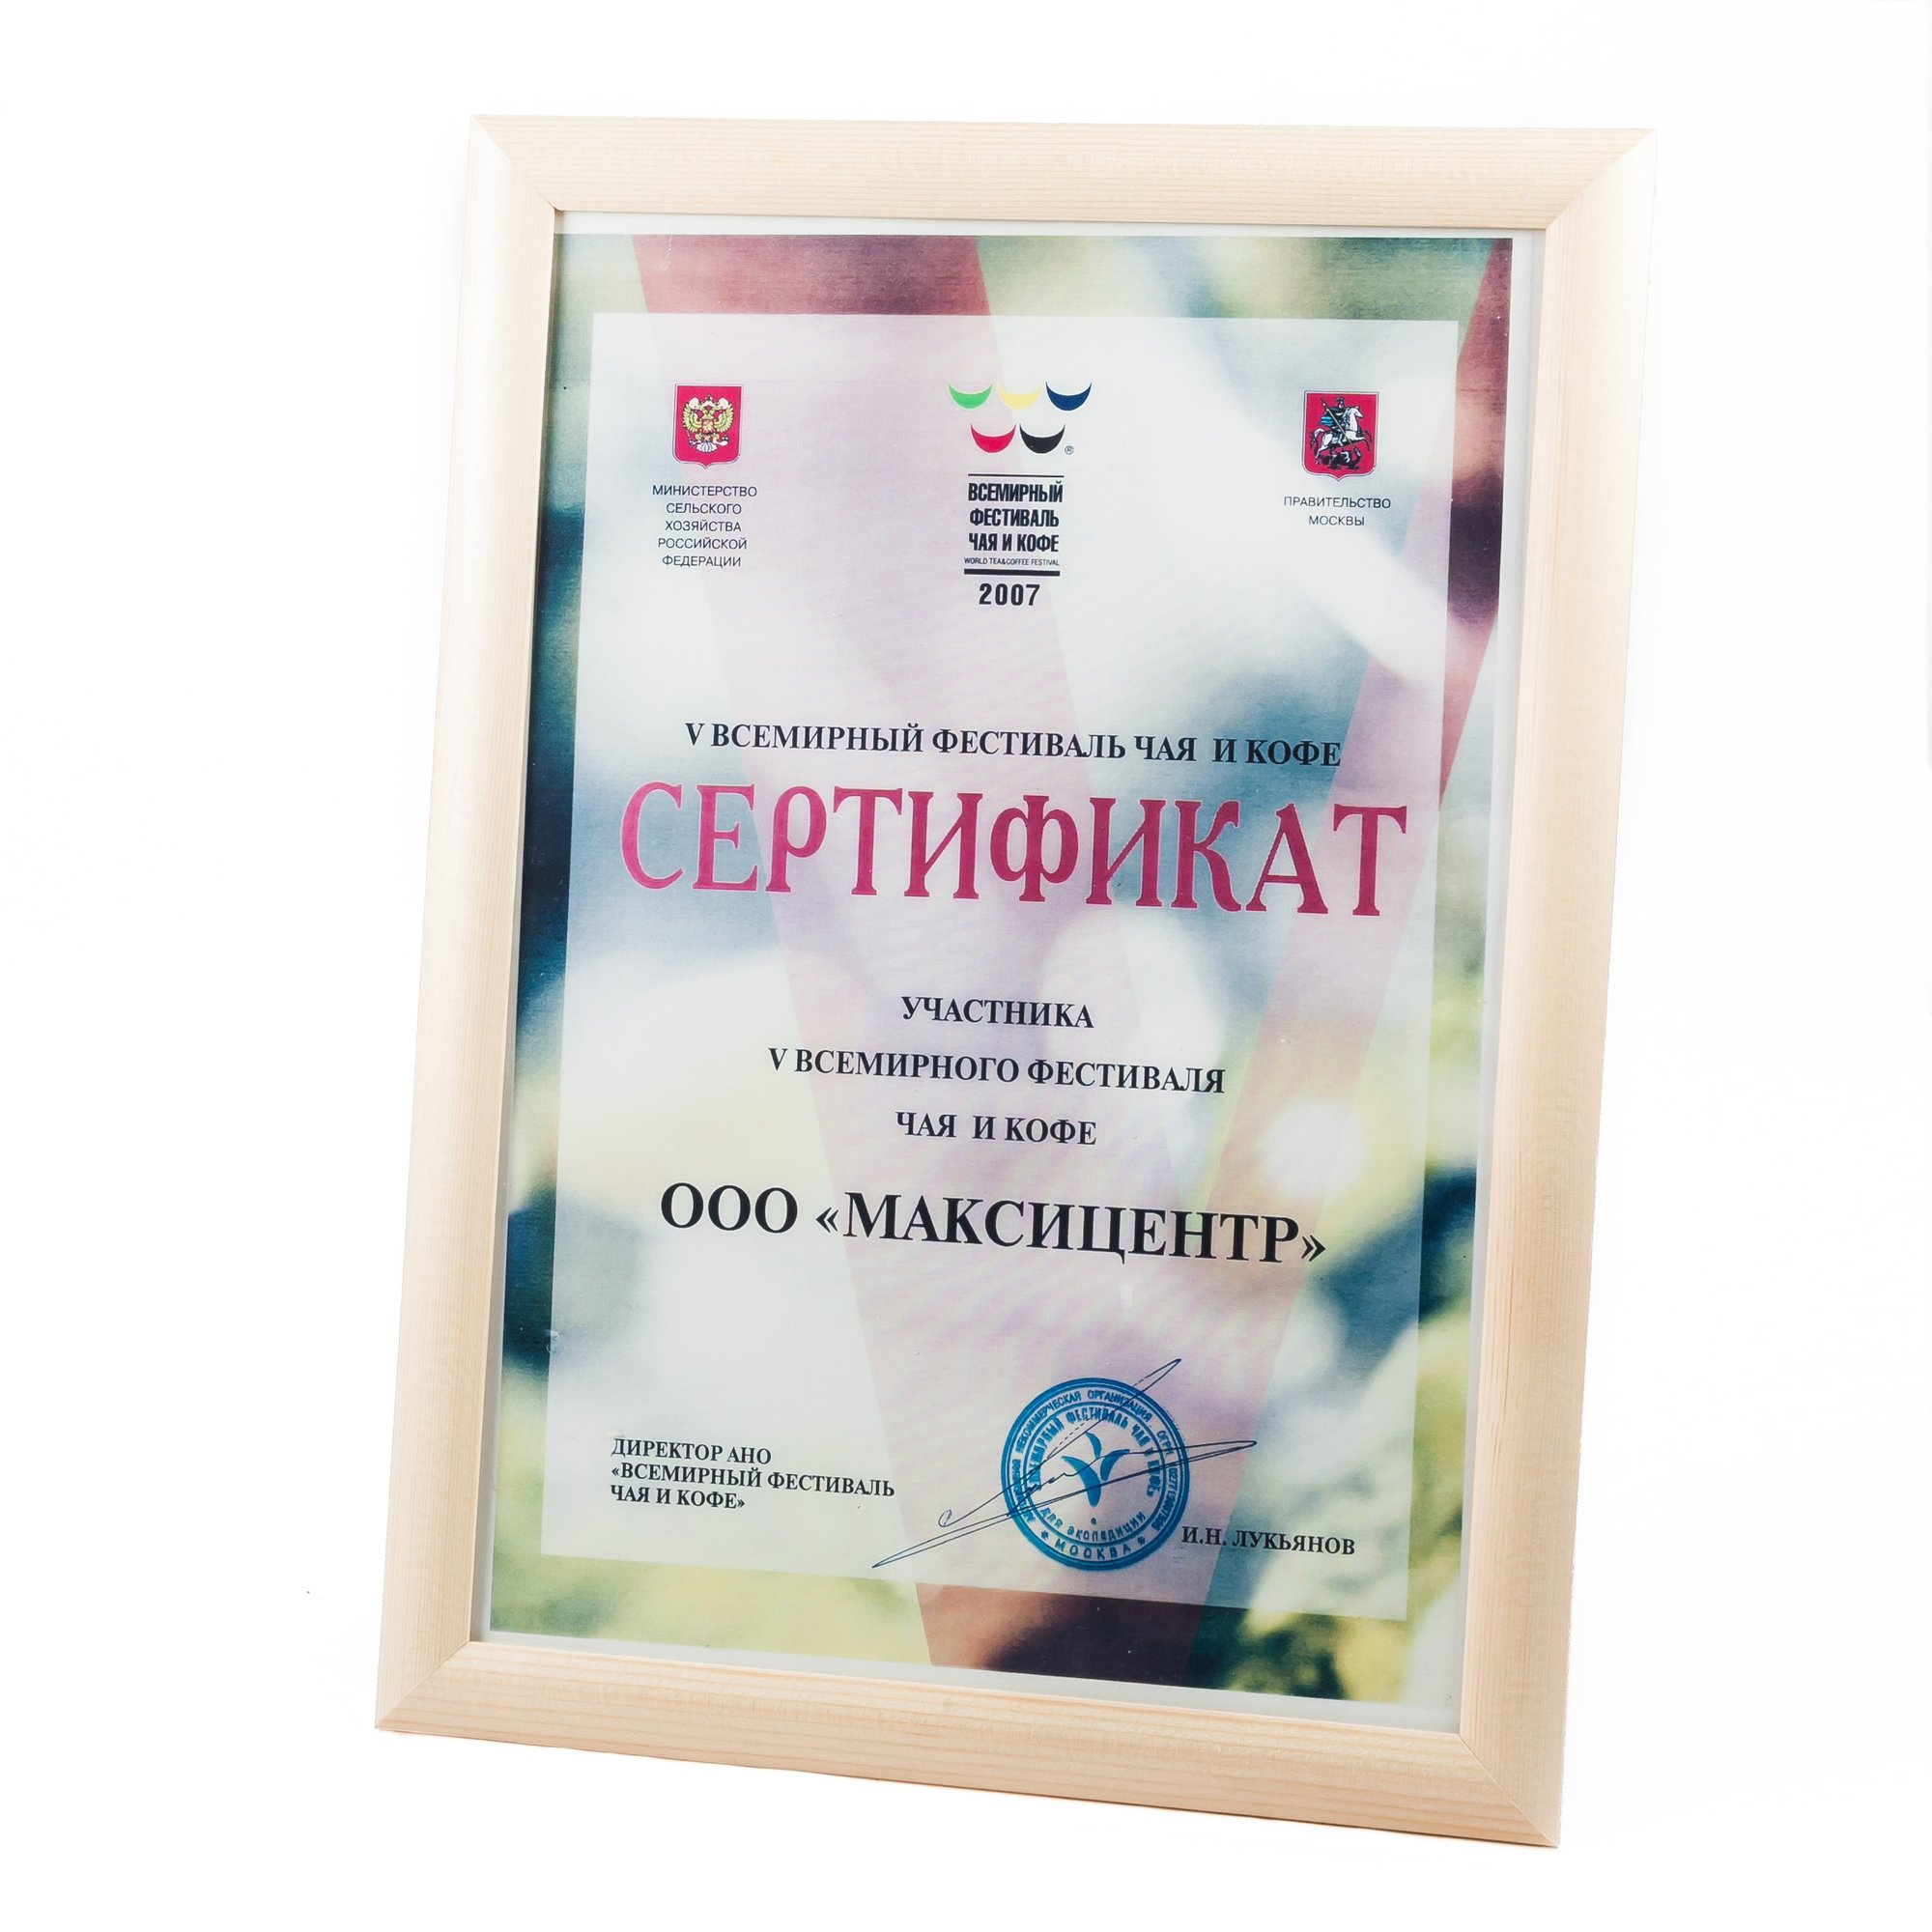 2007-vsemirnyi-festival-chaja-i-kofe.jpg